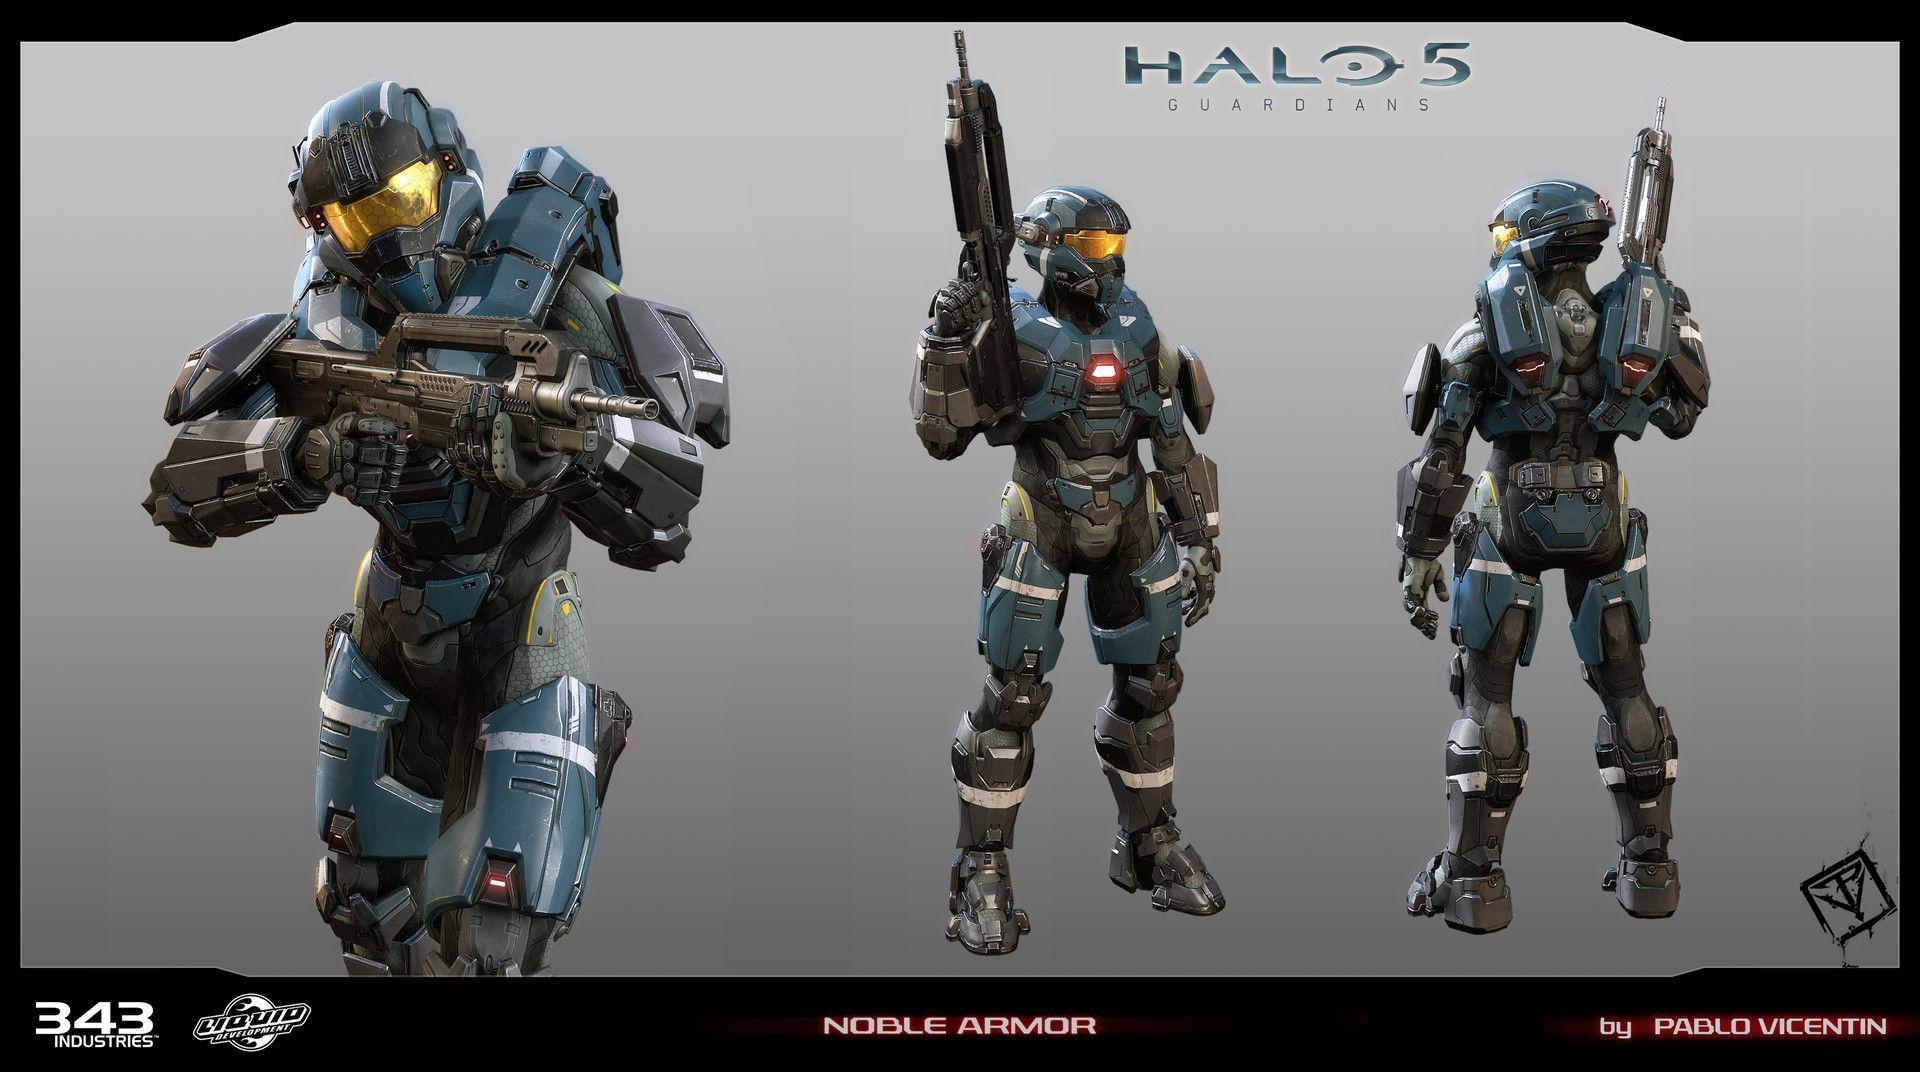 Noble Class Mjolnir Gen2 Halo Armor Halo 5 Guardians Halo